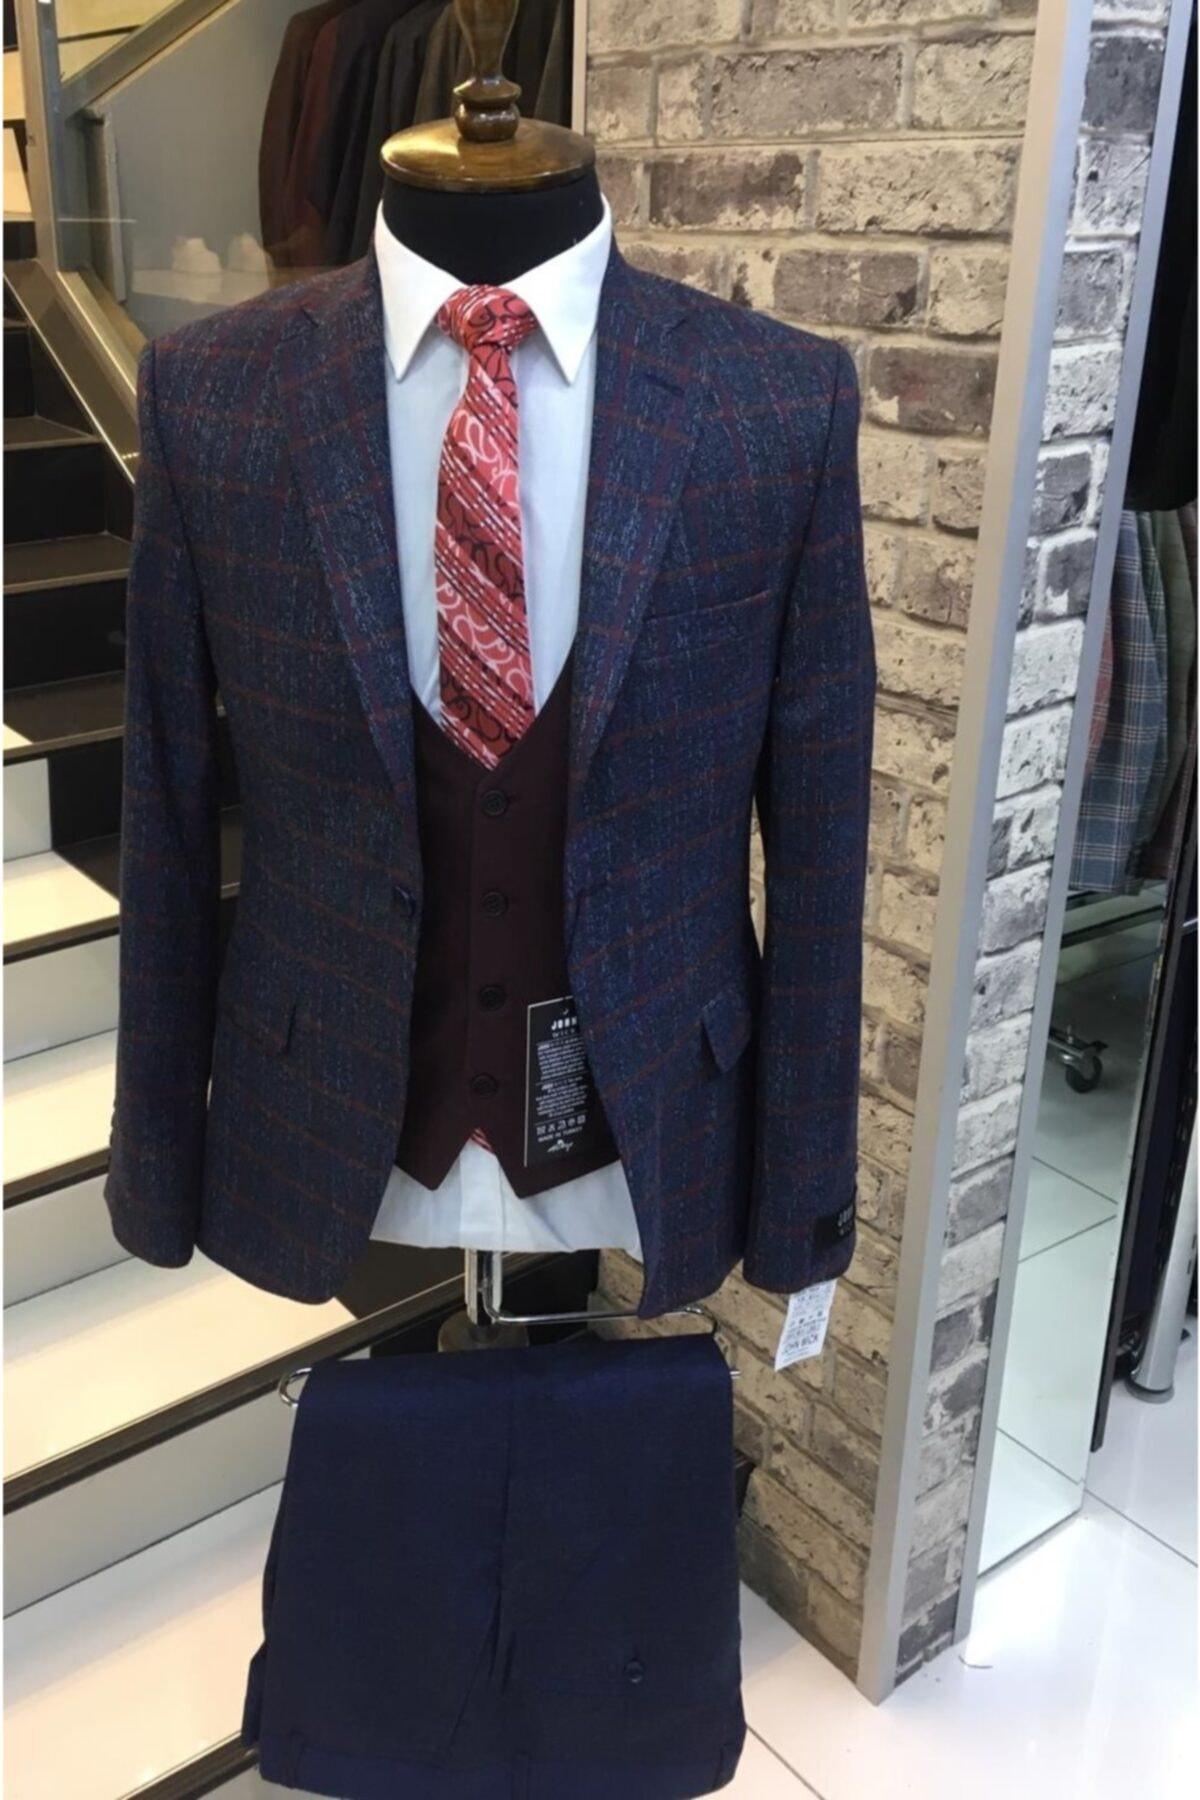 John Wick Erkek Lacivert Mono Yaka Slimfit Takım Elbise 1